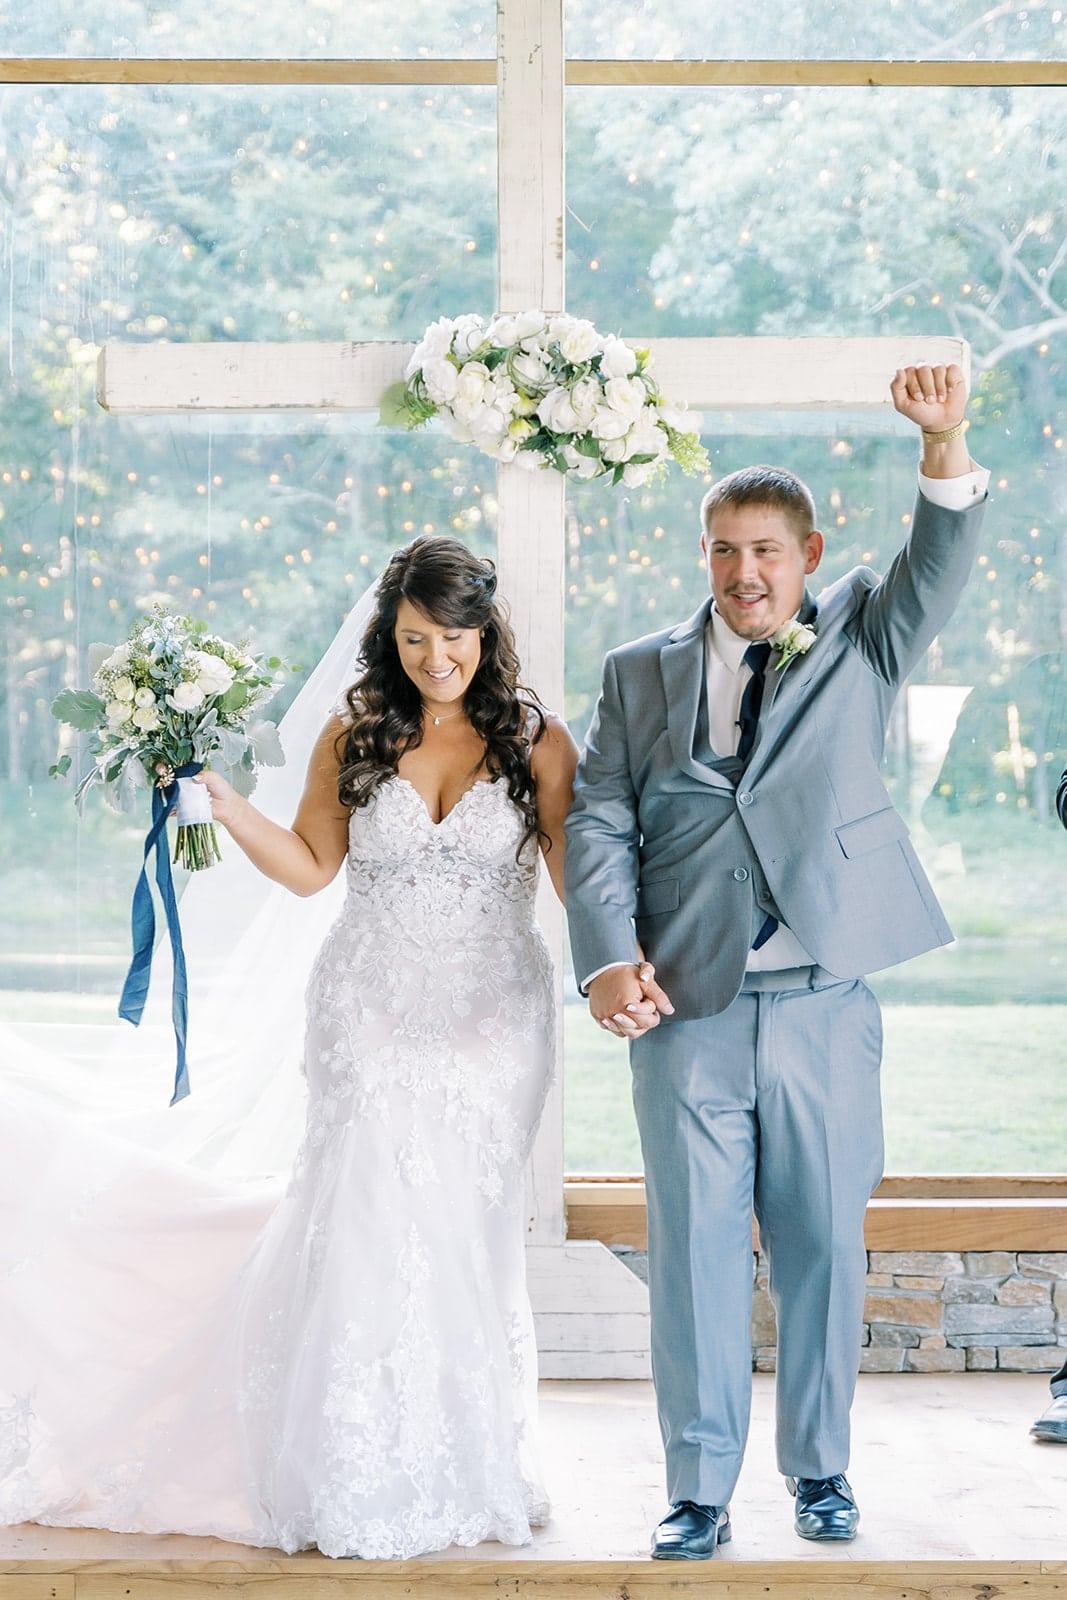 Rustic and Romantic Grace Valley Farm Wedding | Nashville Bride Guide